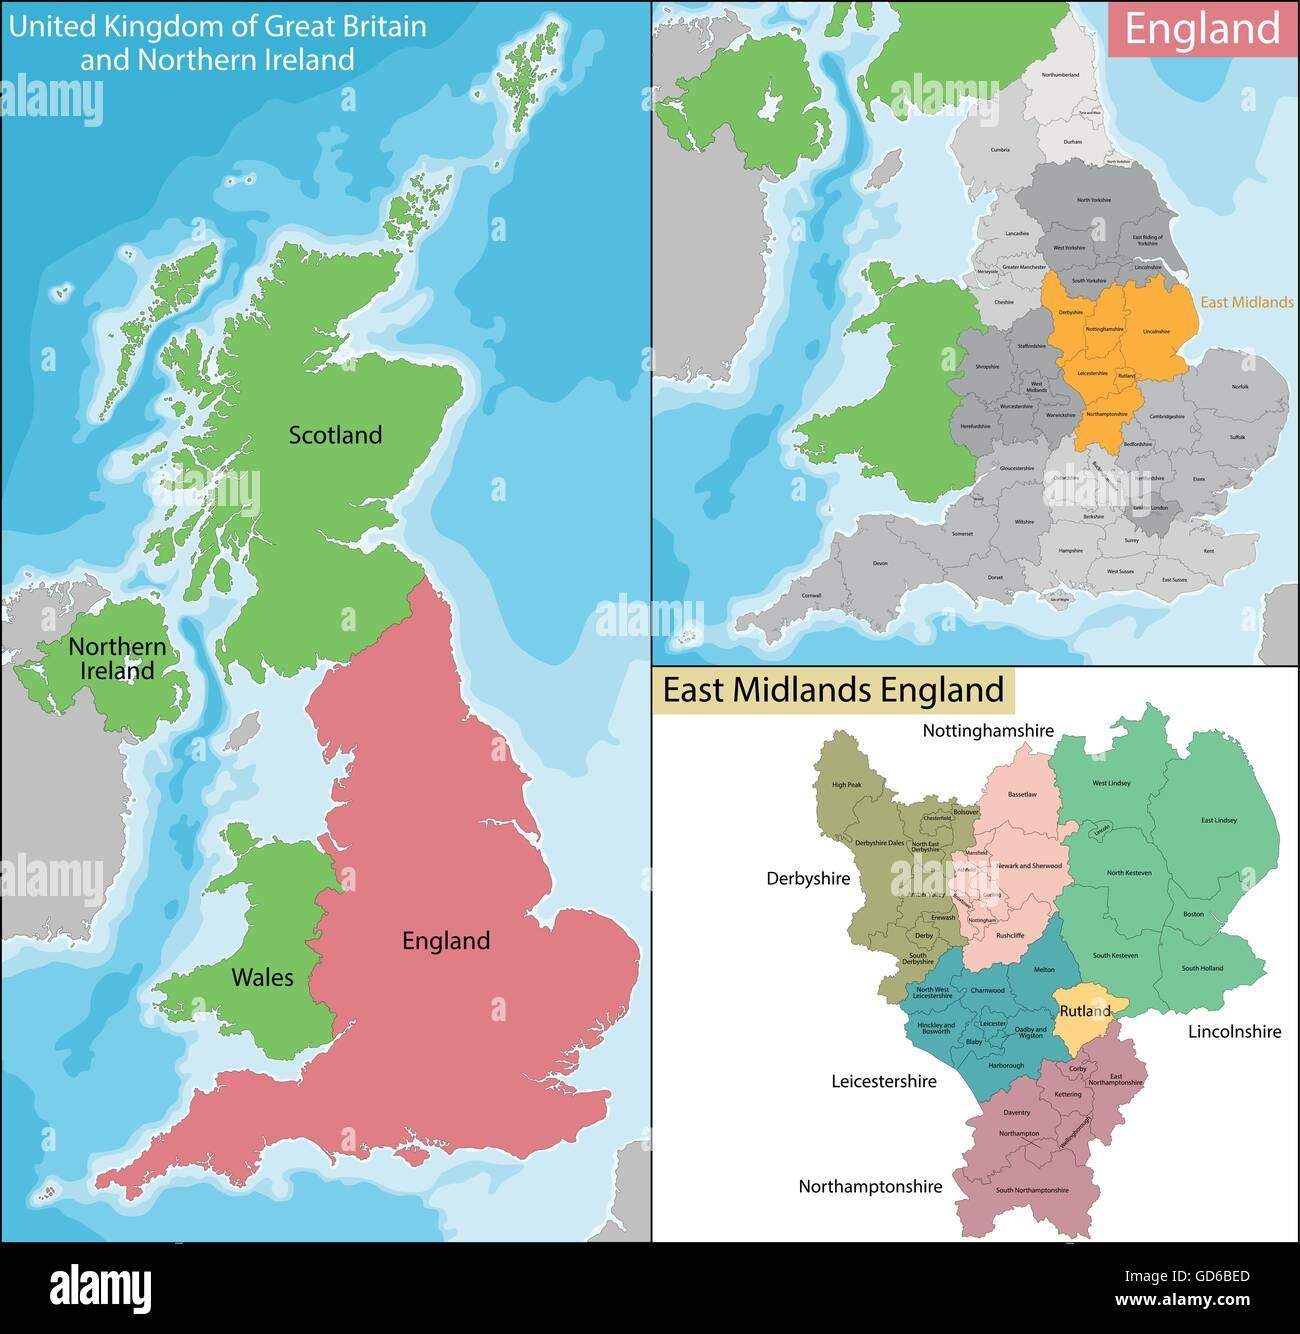 Map Of East Midlands England Stock Vector Art Illustration Vector